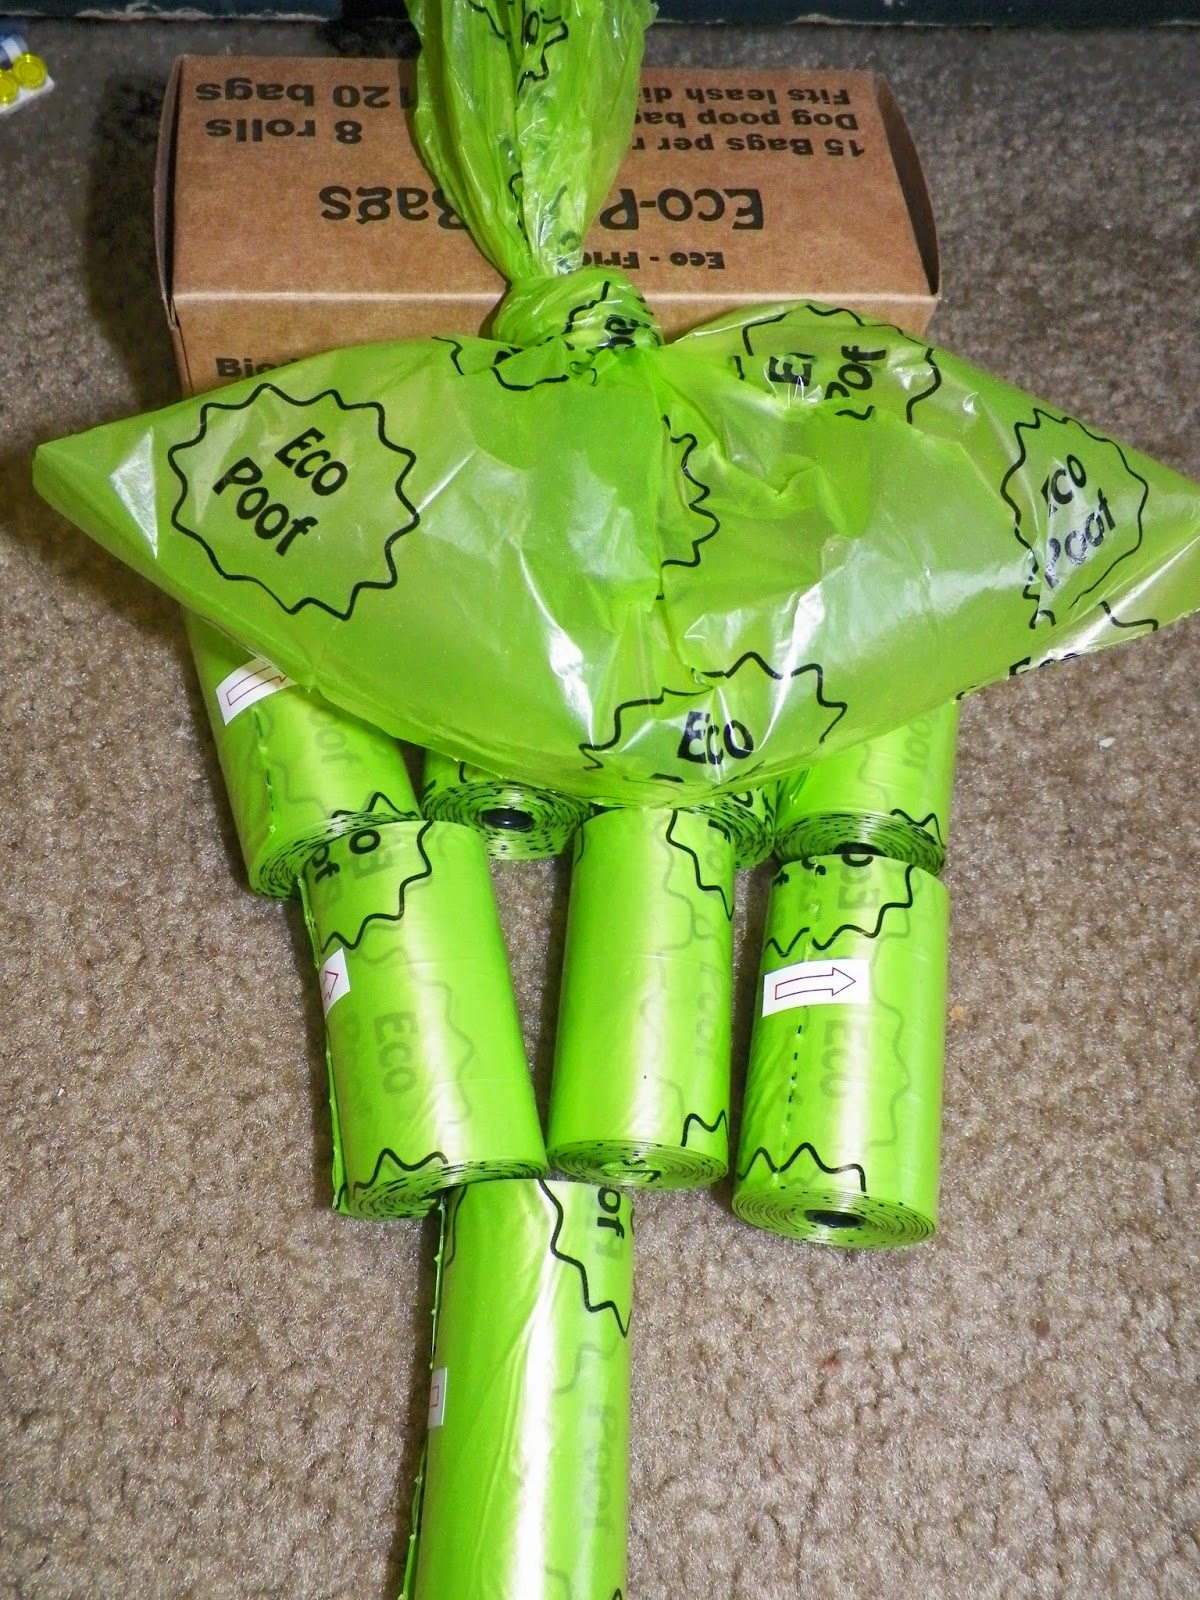 EcoPoofBiodegradableDogWasteBags.jpg